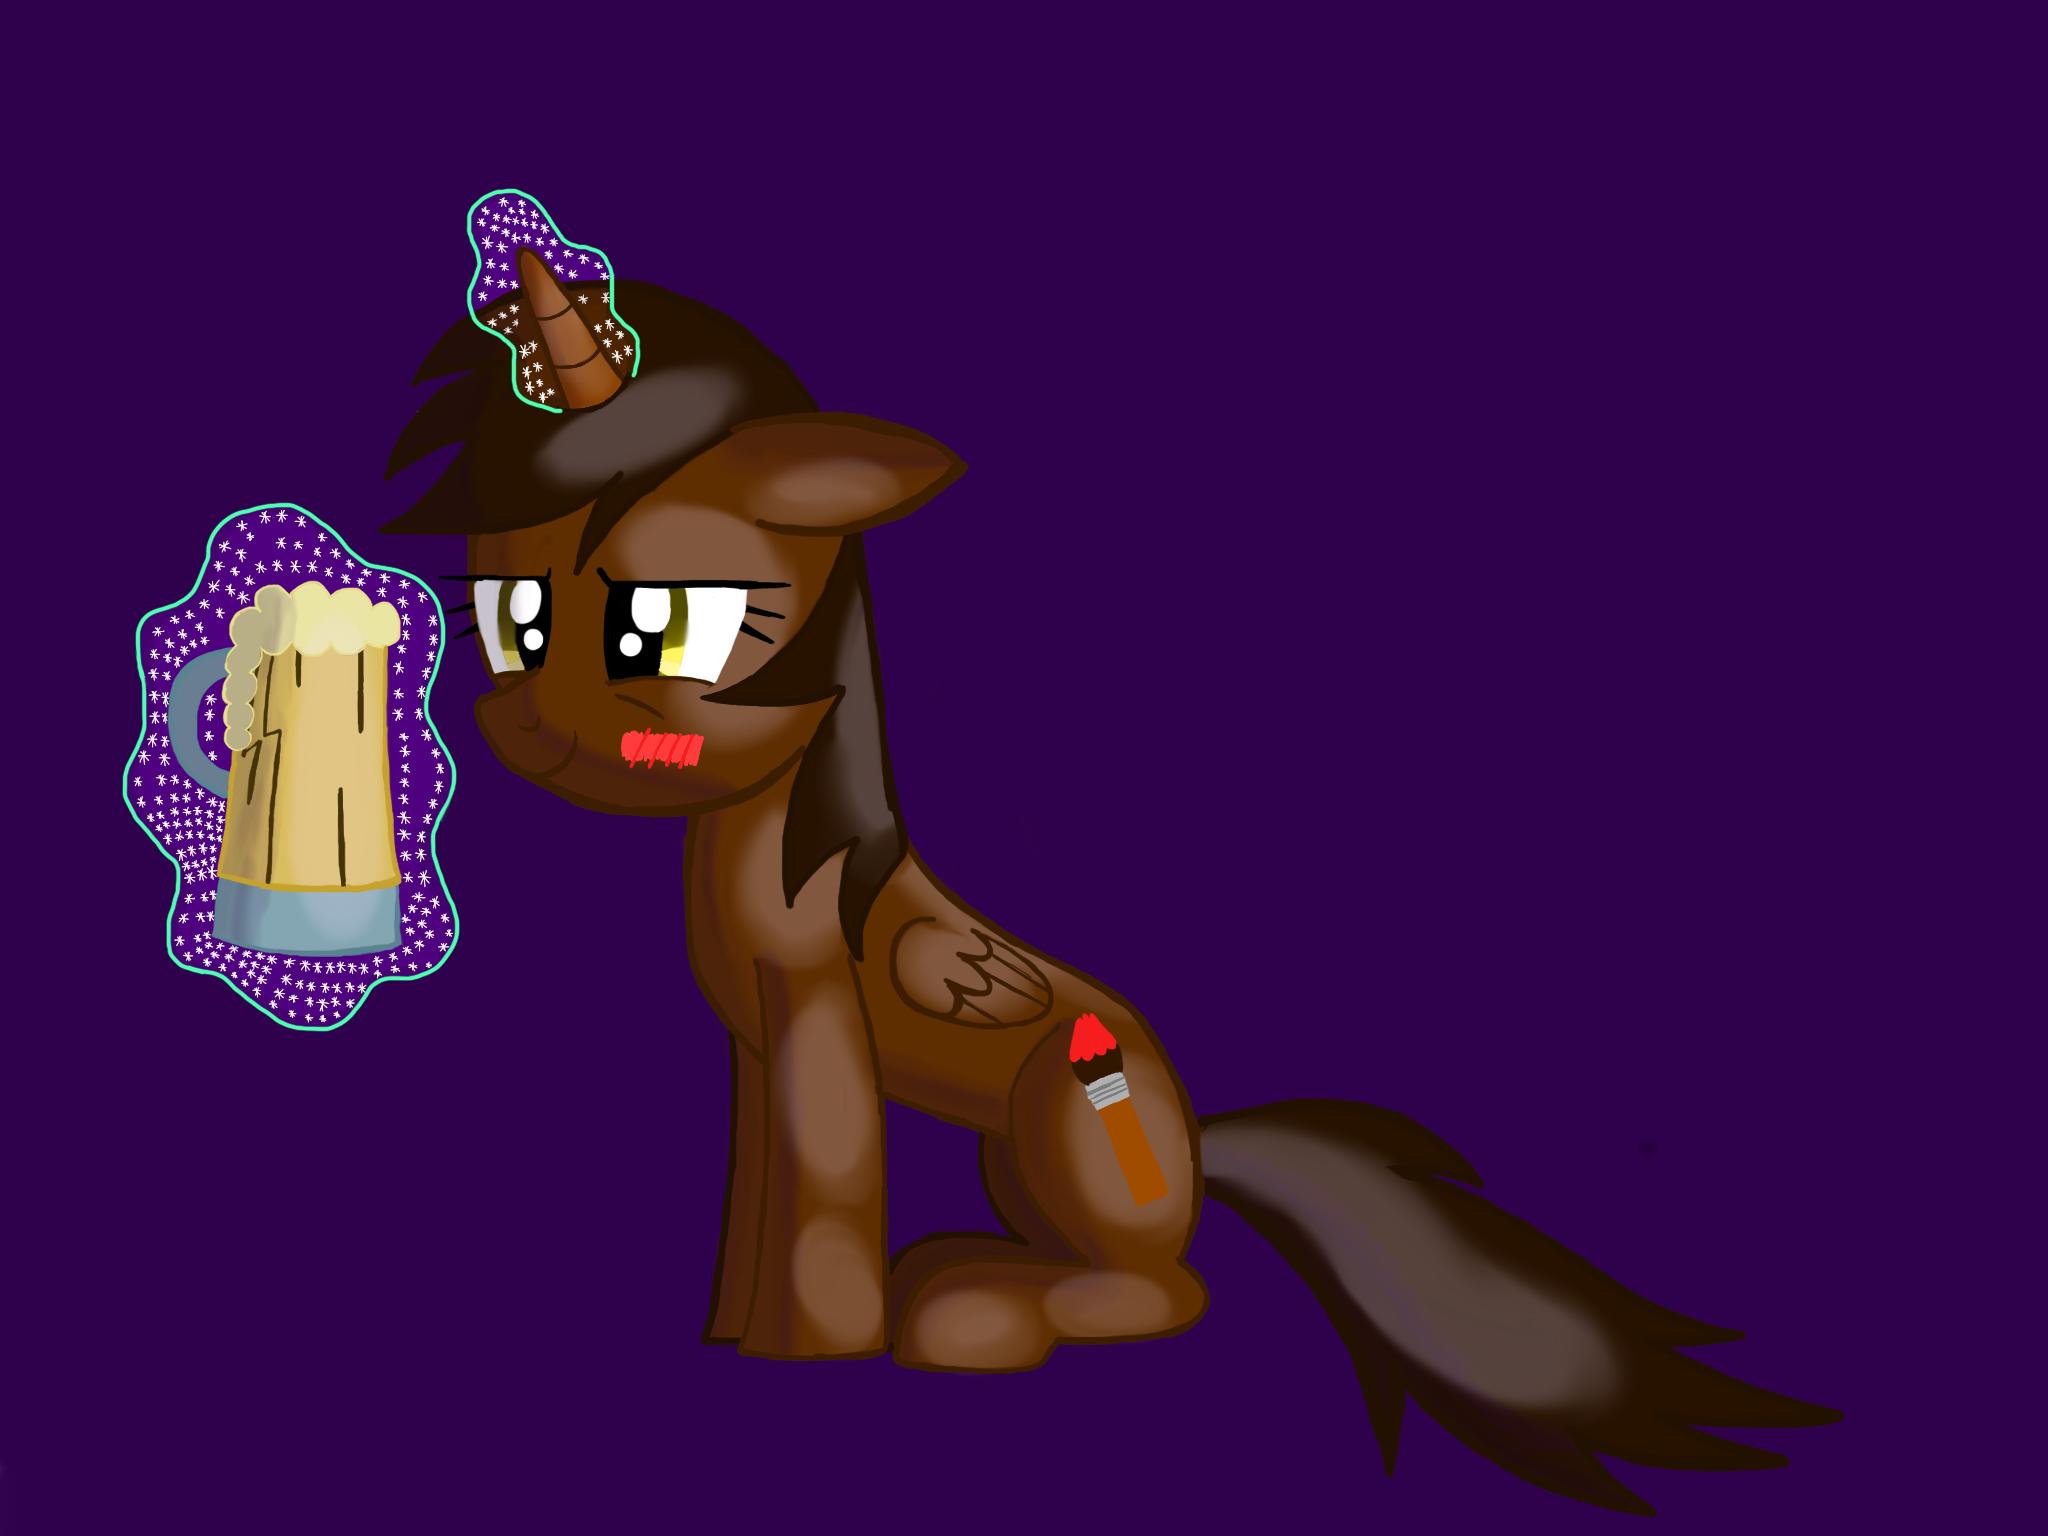 Me drunk by barnowlgurl23